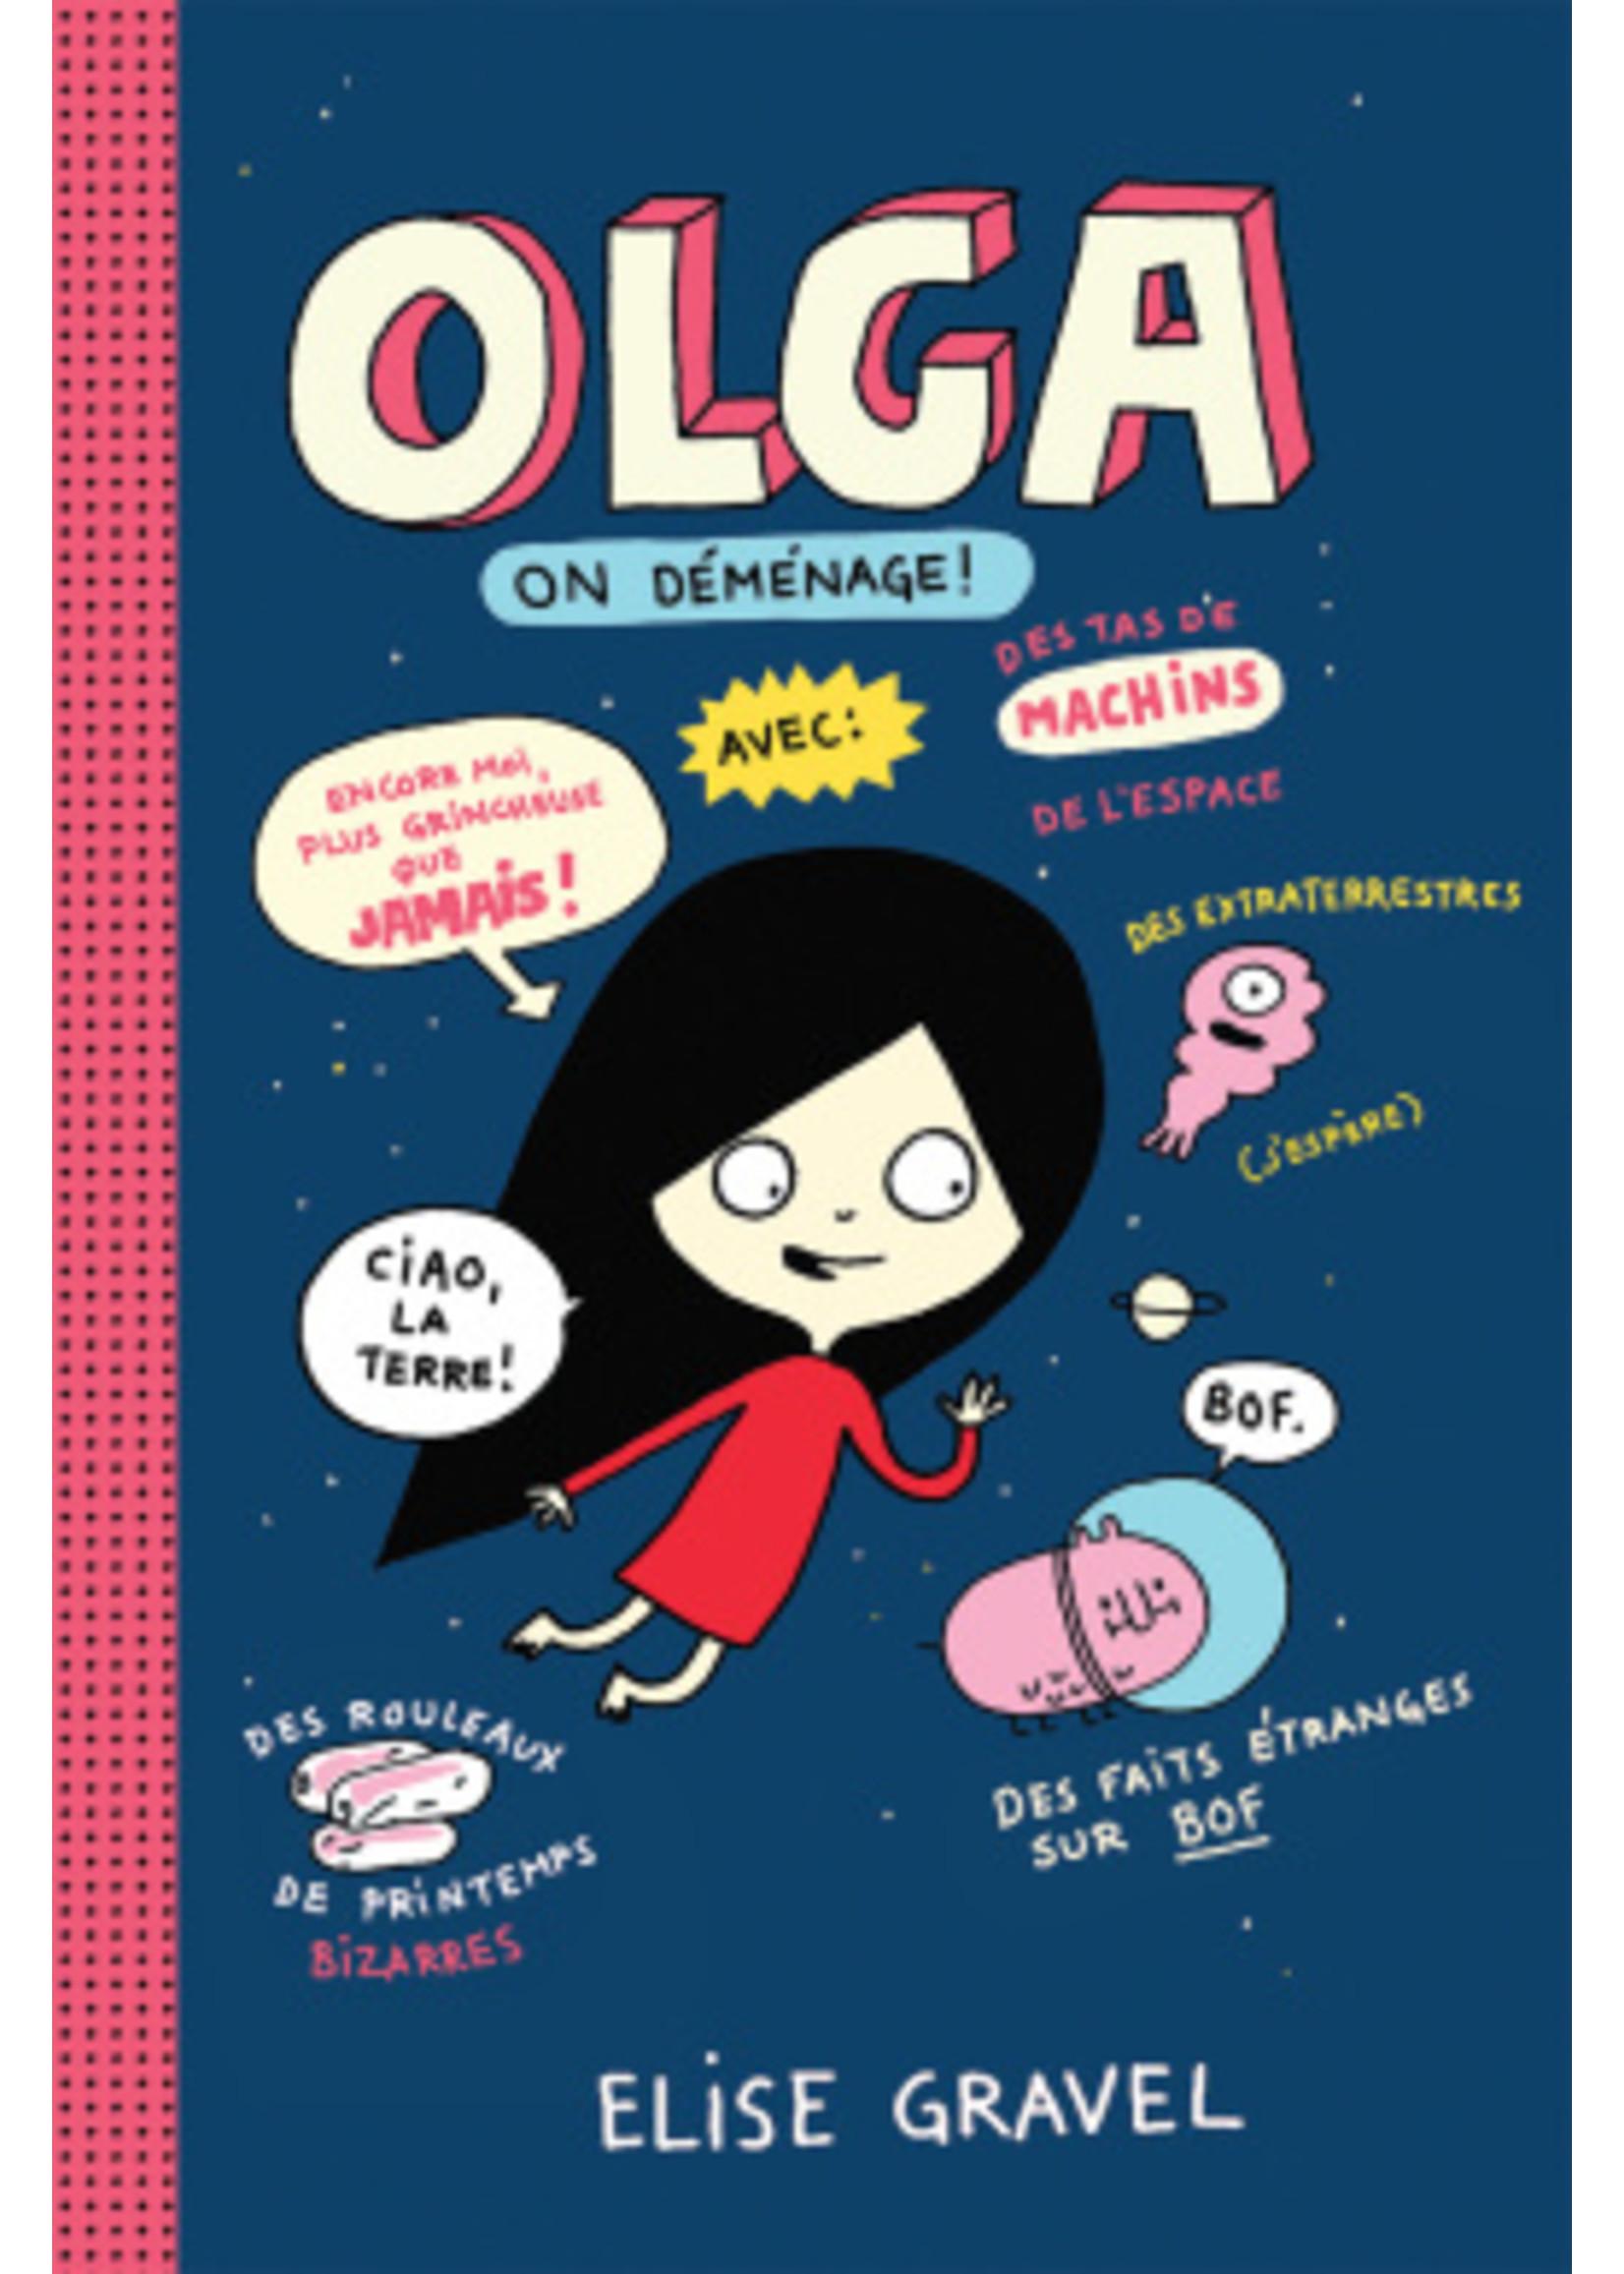 Scholastic Olga 2, On déménage